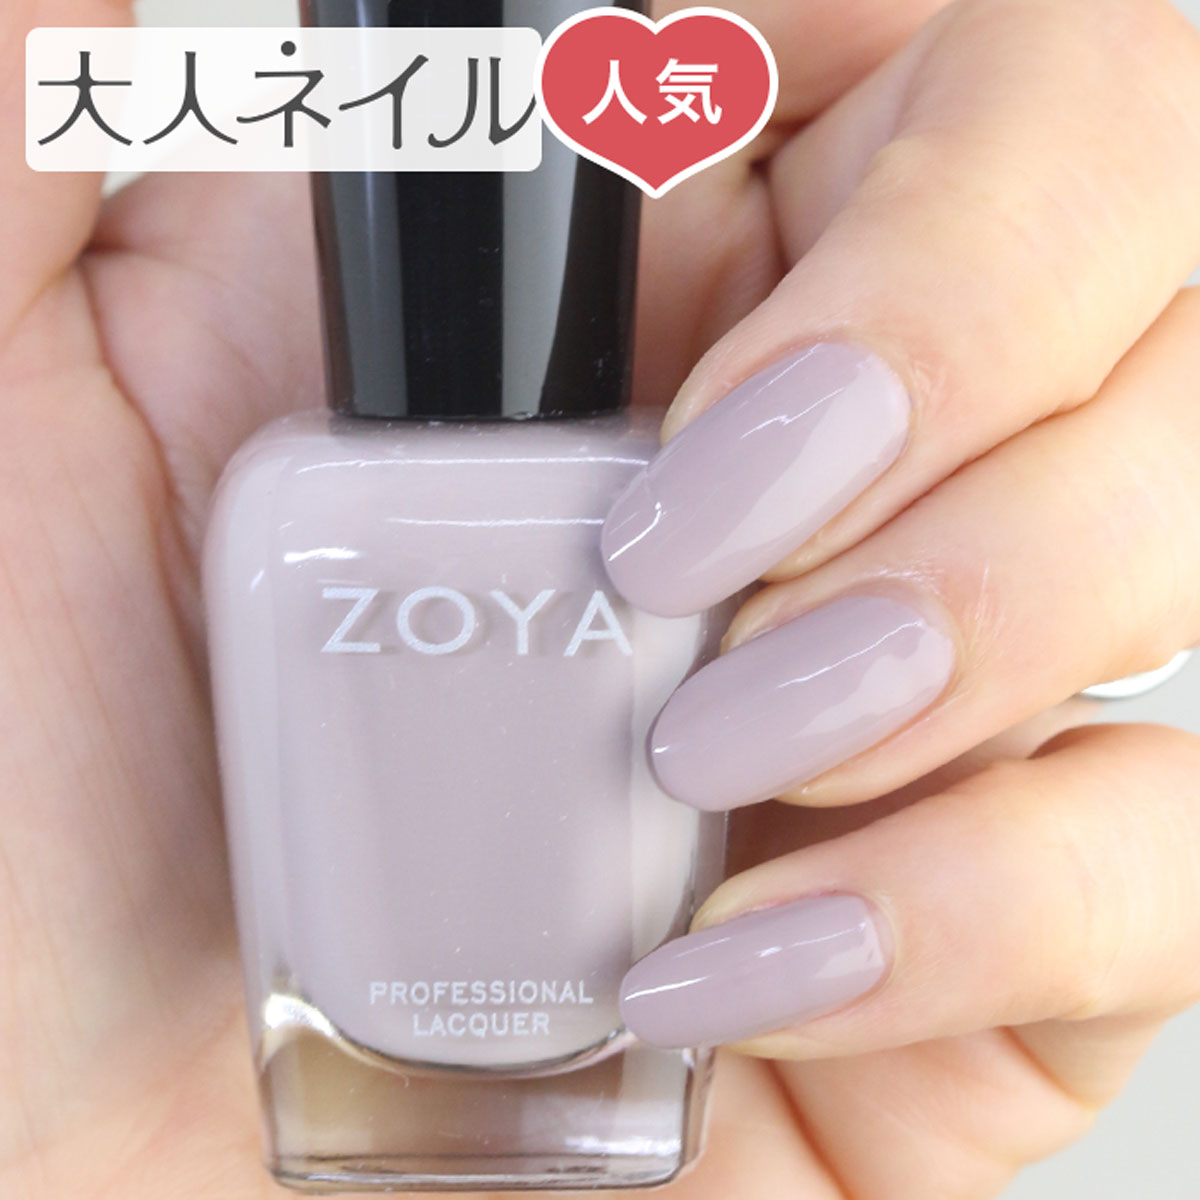 ZOYA ゾーヤ ゾヤ ネイルカラー ZP825 15mL Eastyn Whispers 自爪 の為に作られた ネイル にやさしい 自然派 マニキュア zoya セルフネイル にもおすすめ スモーキー グレープ パープル 紫 人気 トップ5